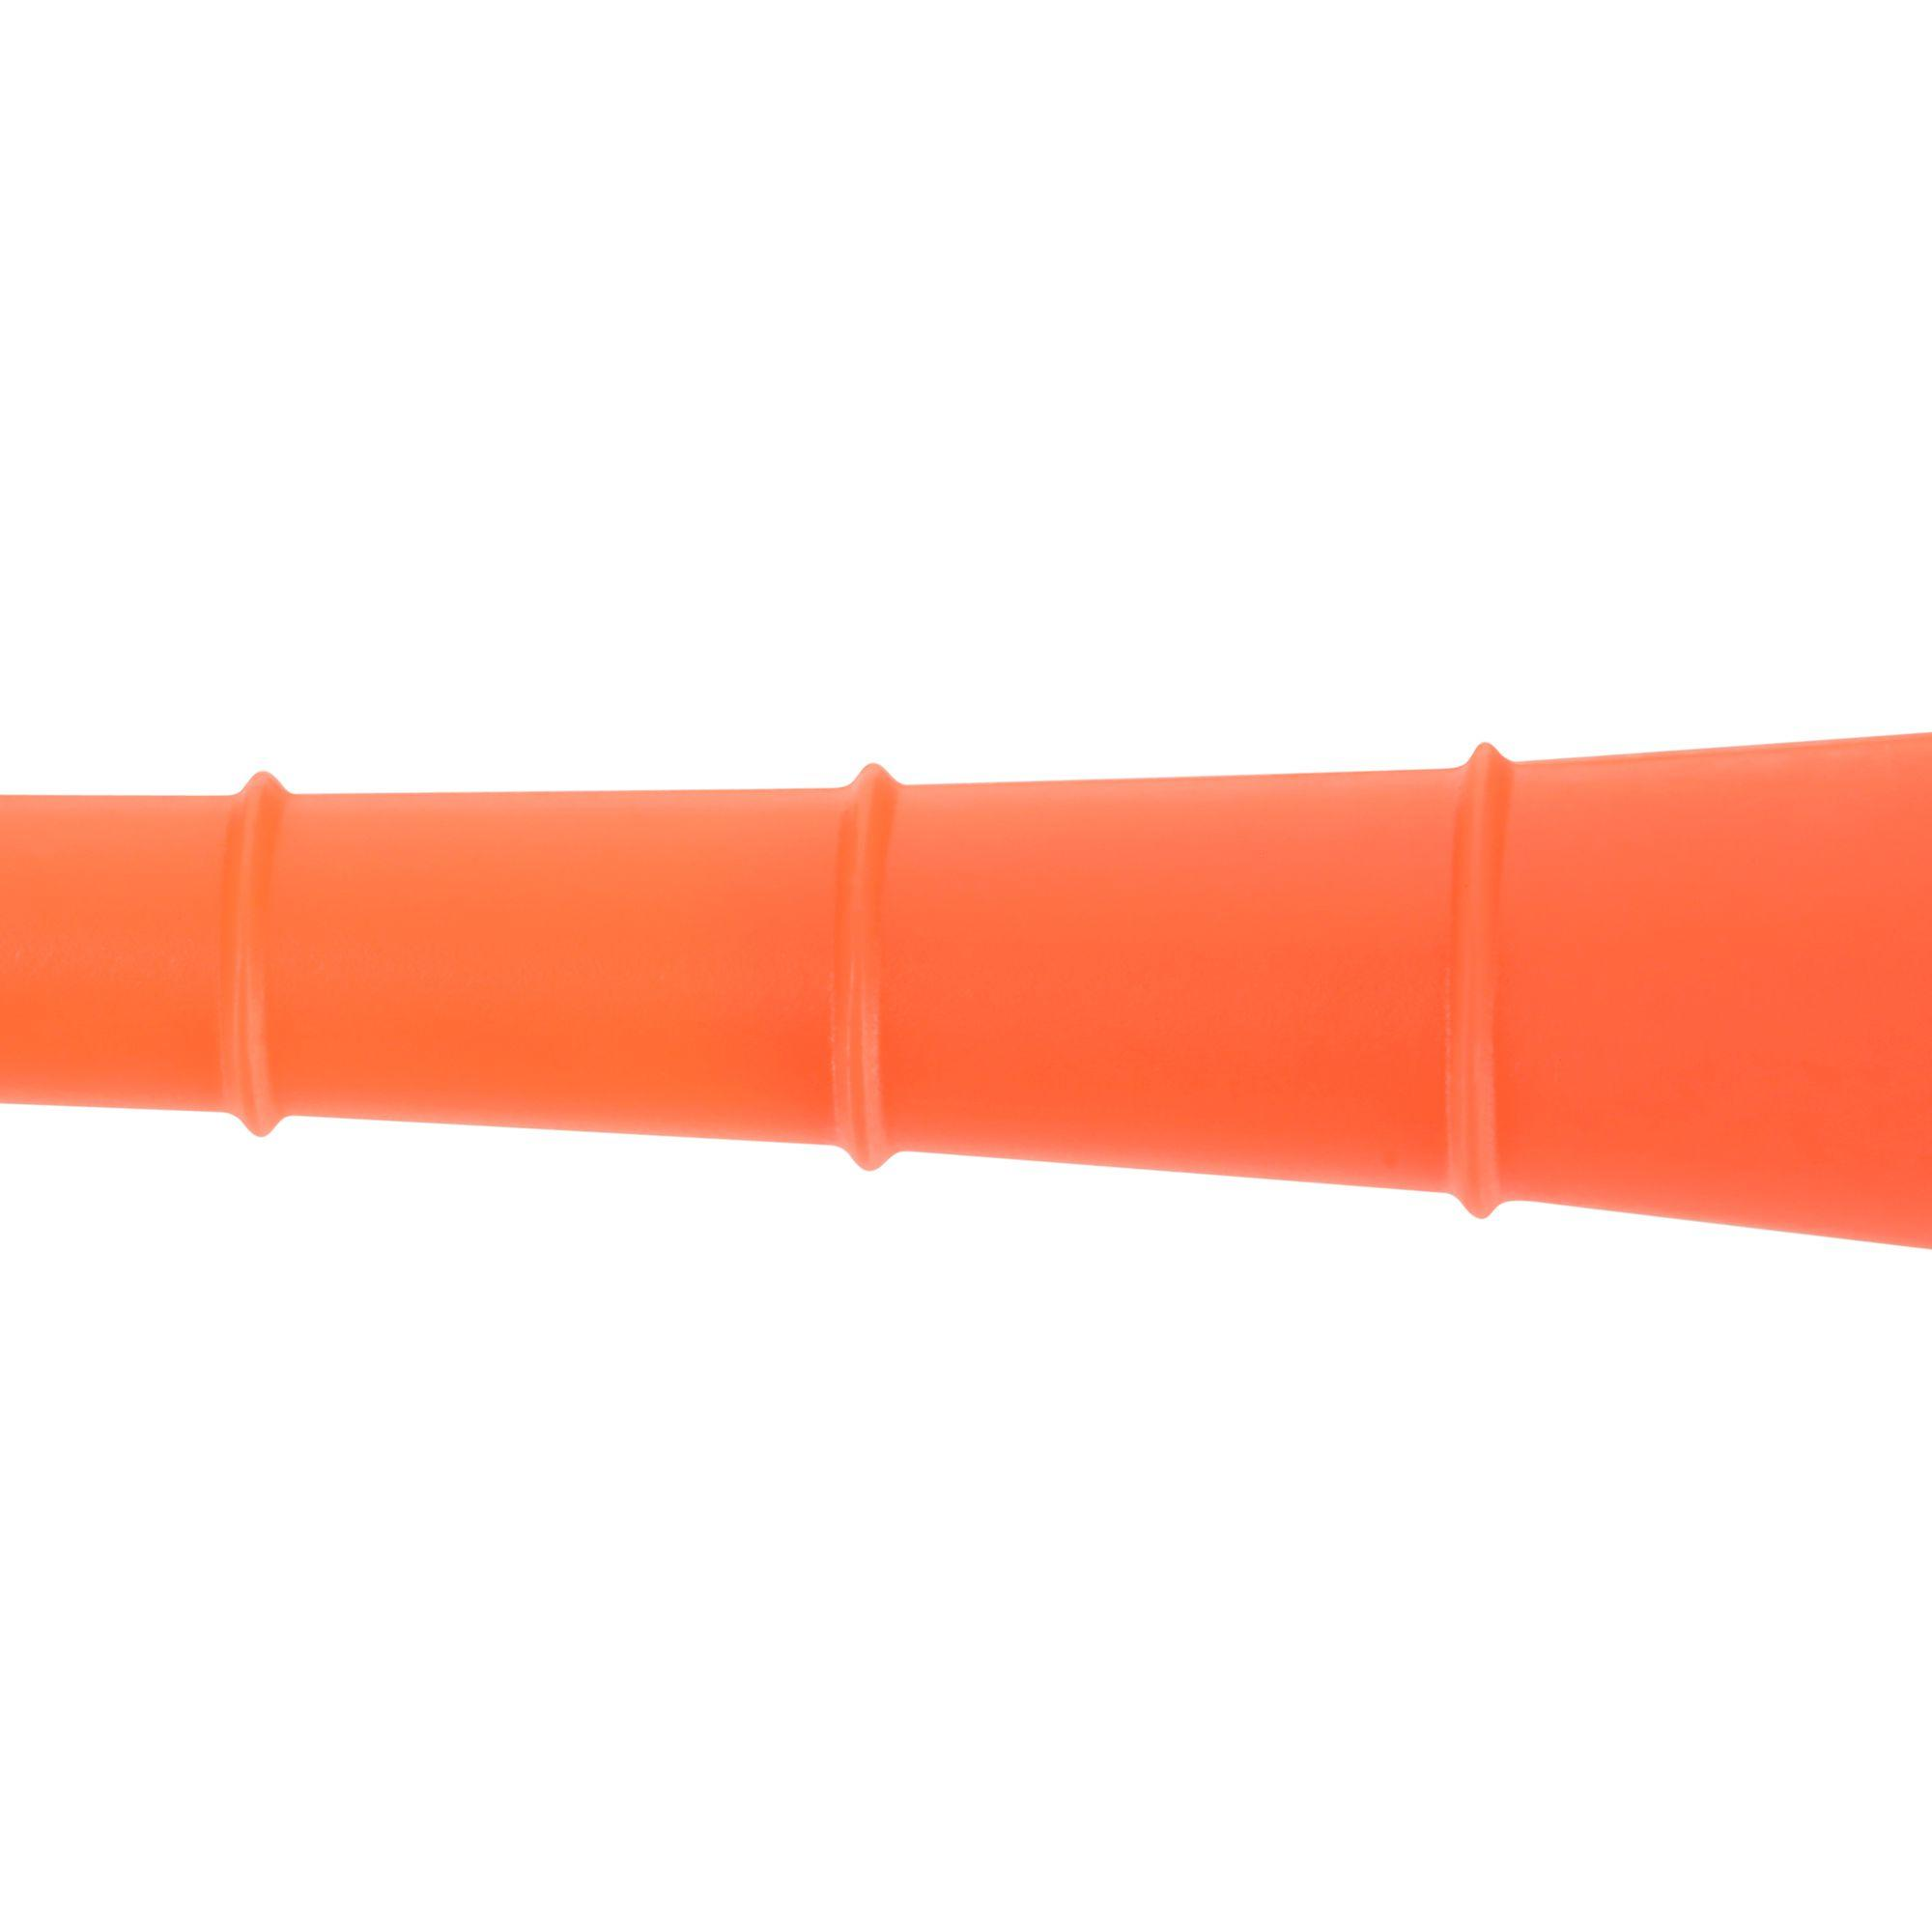 70 mm Plastic Tee x10 - Orange